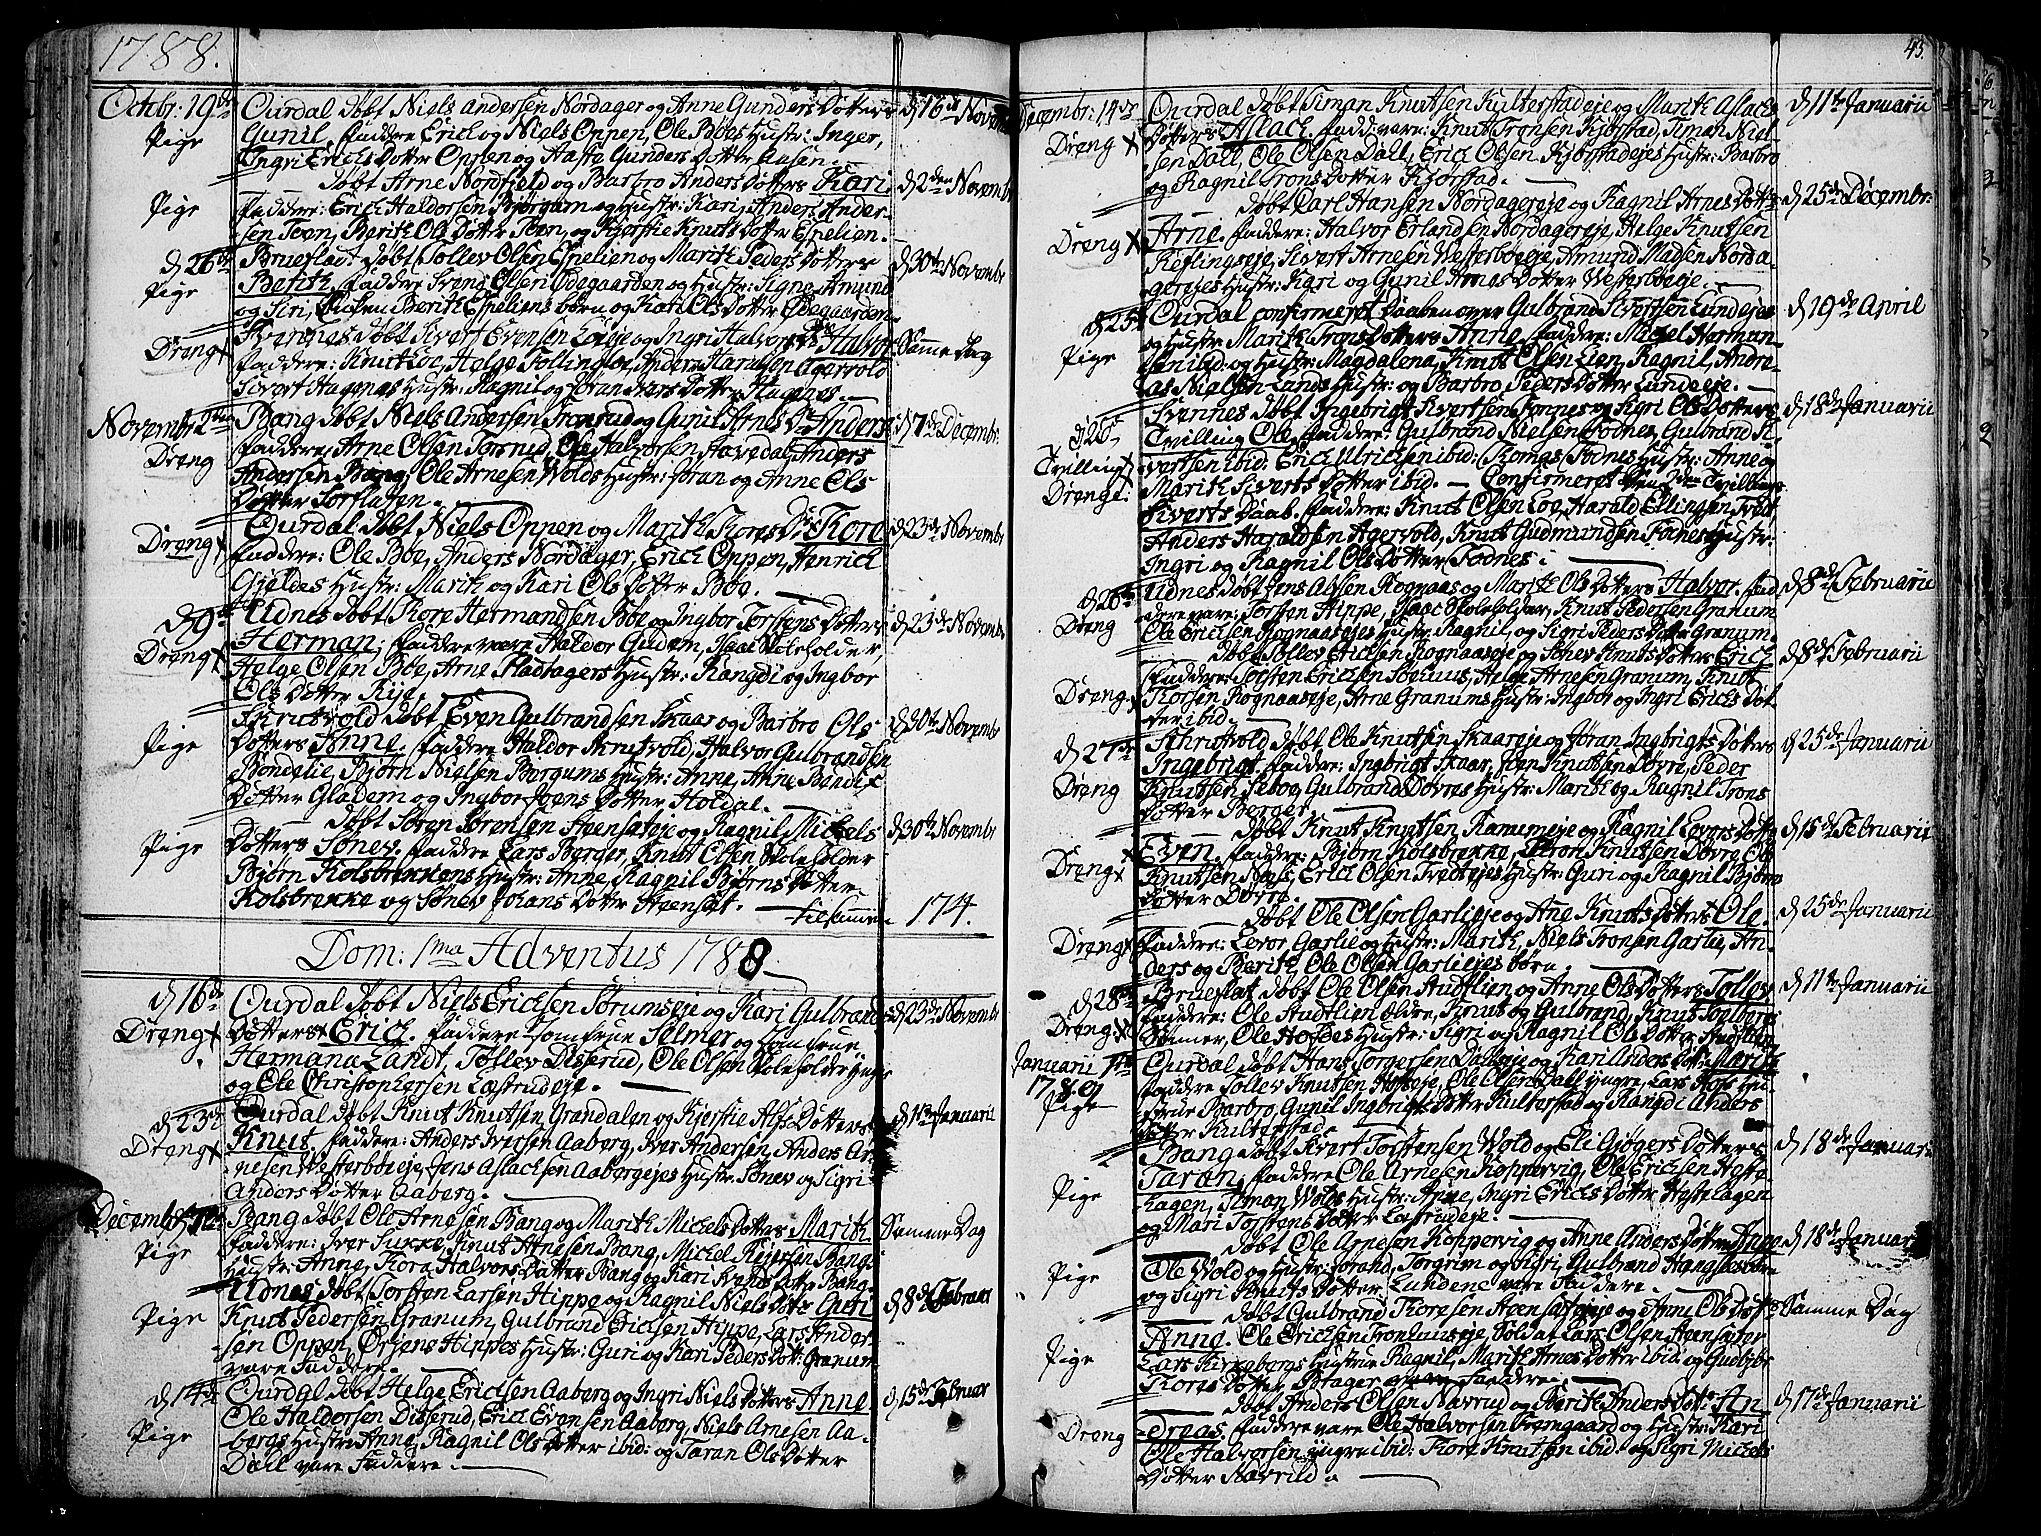 SAH, Aurdal prestekontor, Ministerialbok nr. 6, 1781-1804, s. 43